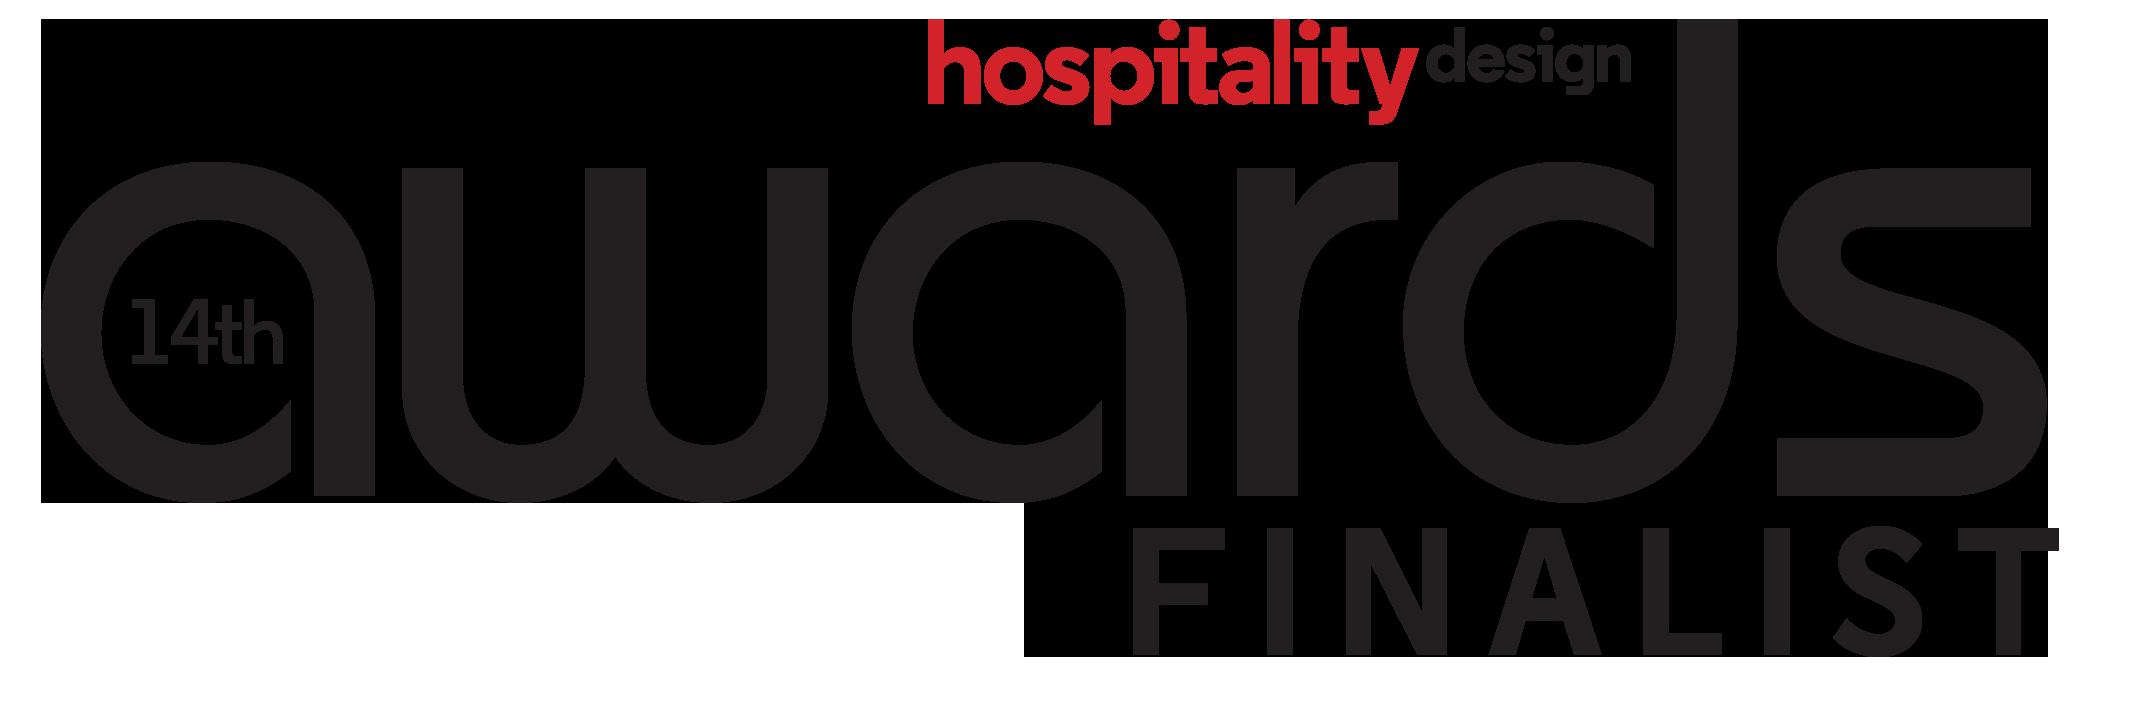 Logo hospitality design awards finalist